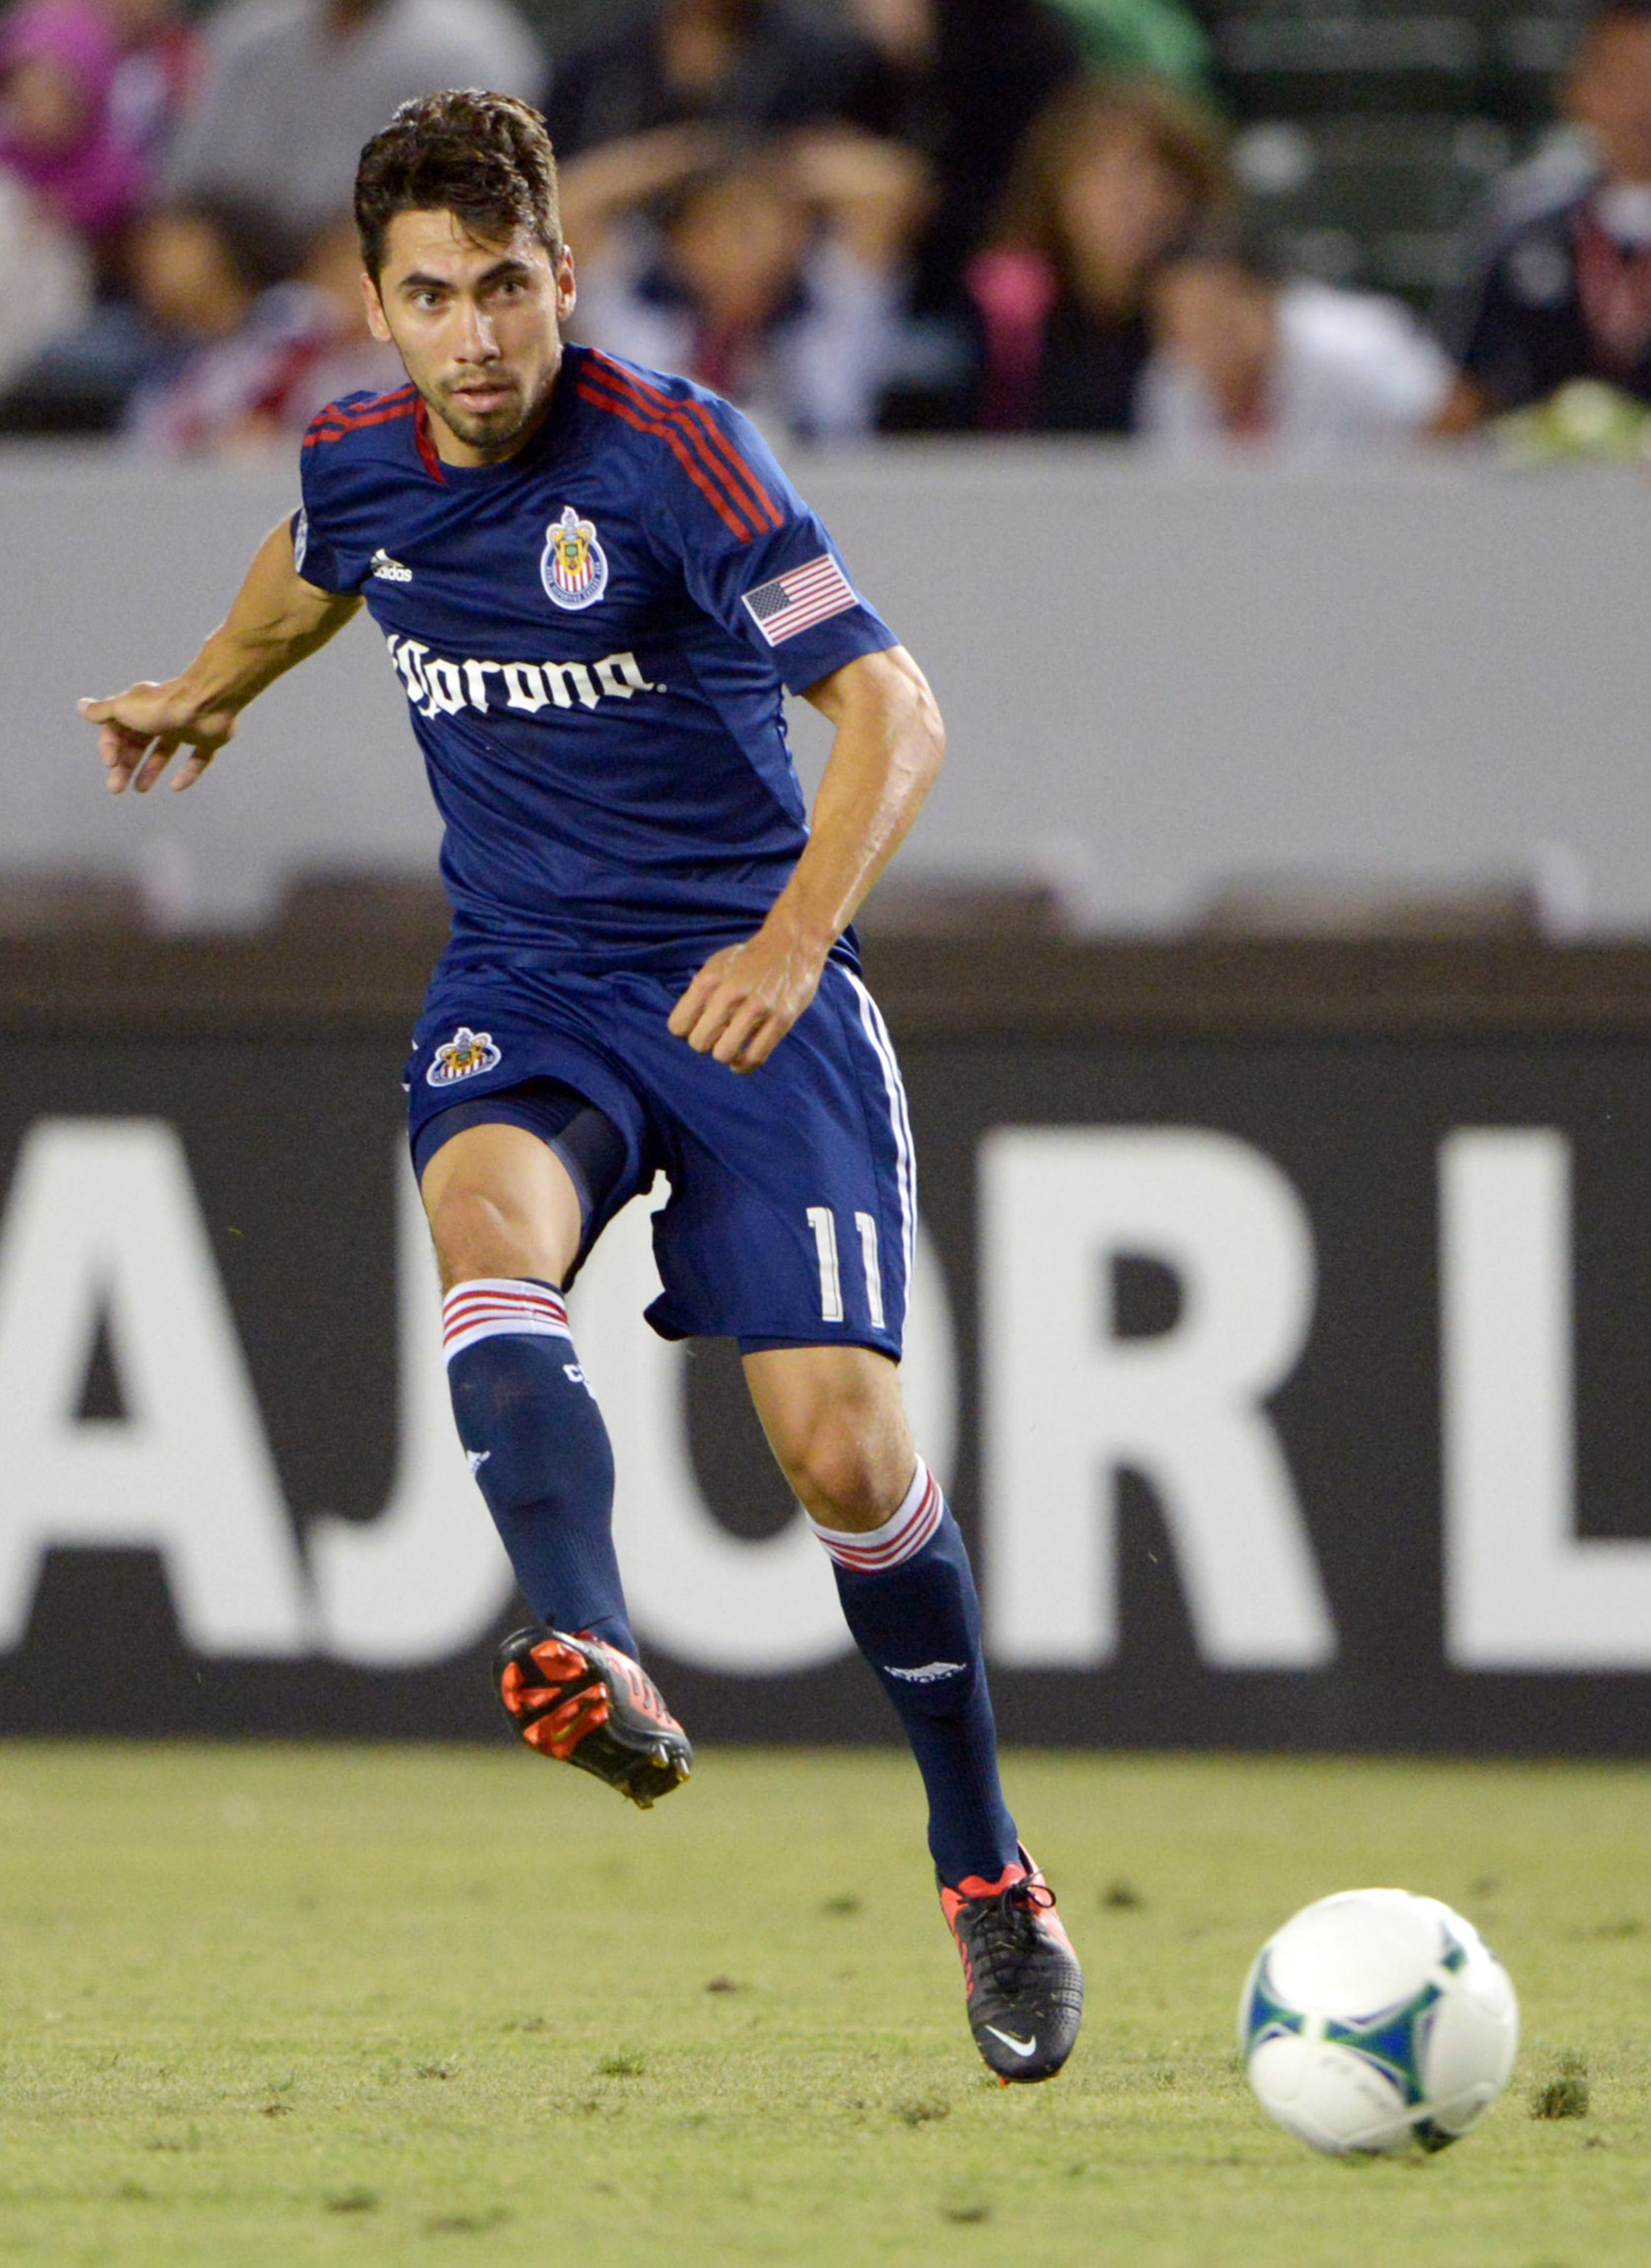 Gabriel Farfan left Chivas USA at a numerical disadvantage in their last match